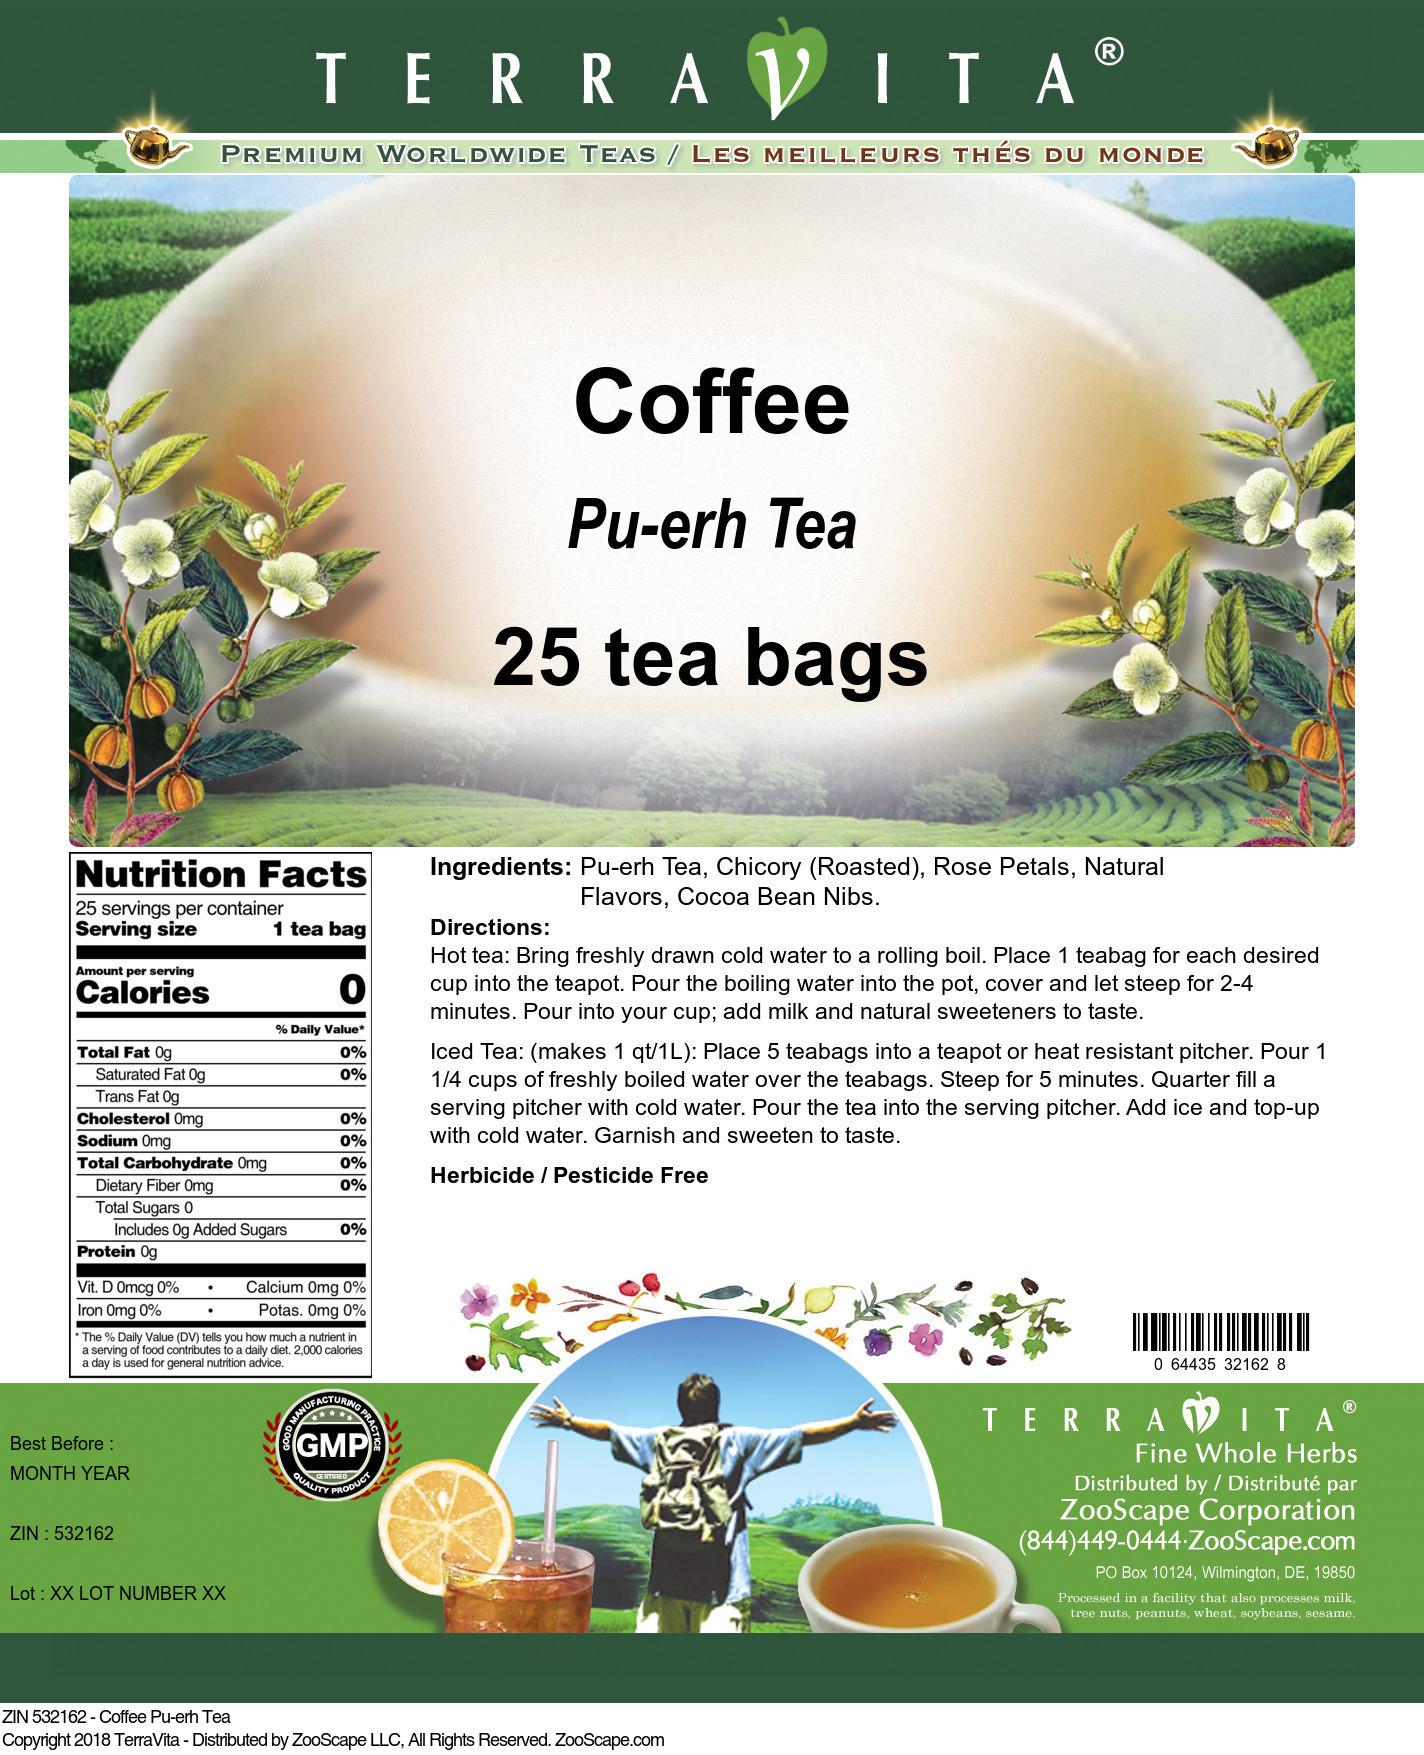 Coffee Pu-erh Tea